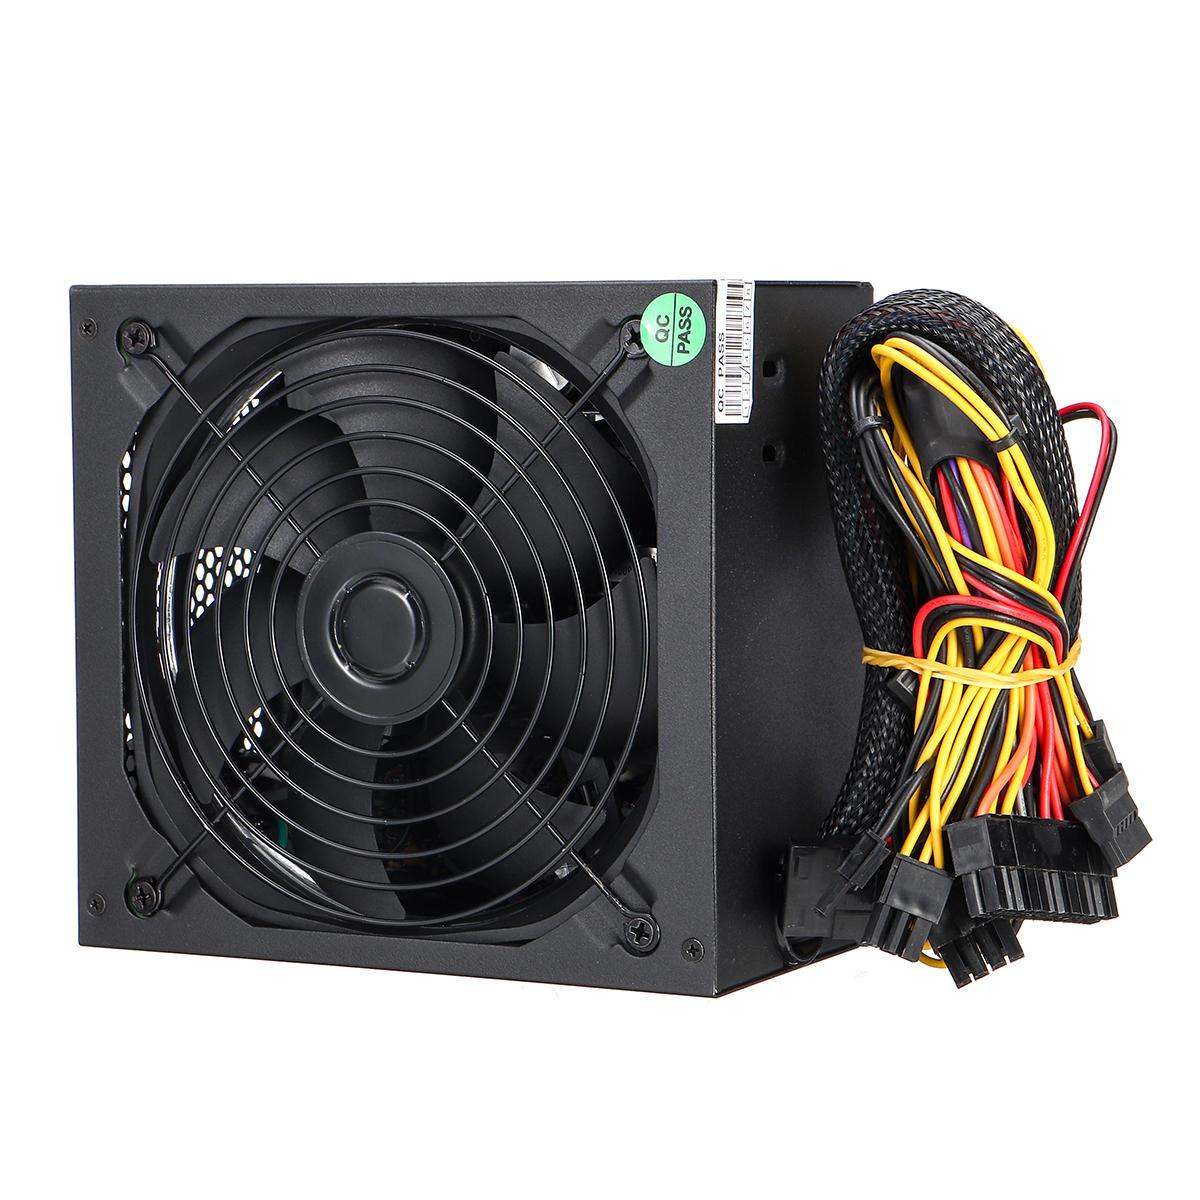 1000W PC Computer Power Supply Quiet 140mm Green LED Fan 24Pin SATA 6Pin 8Pin